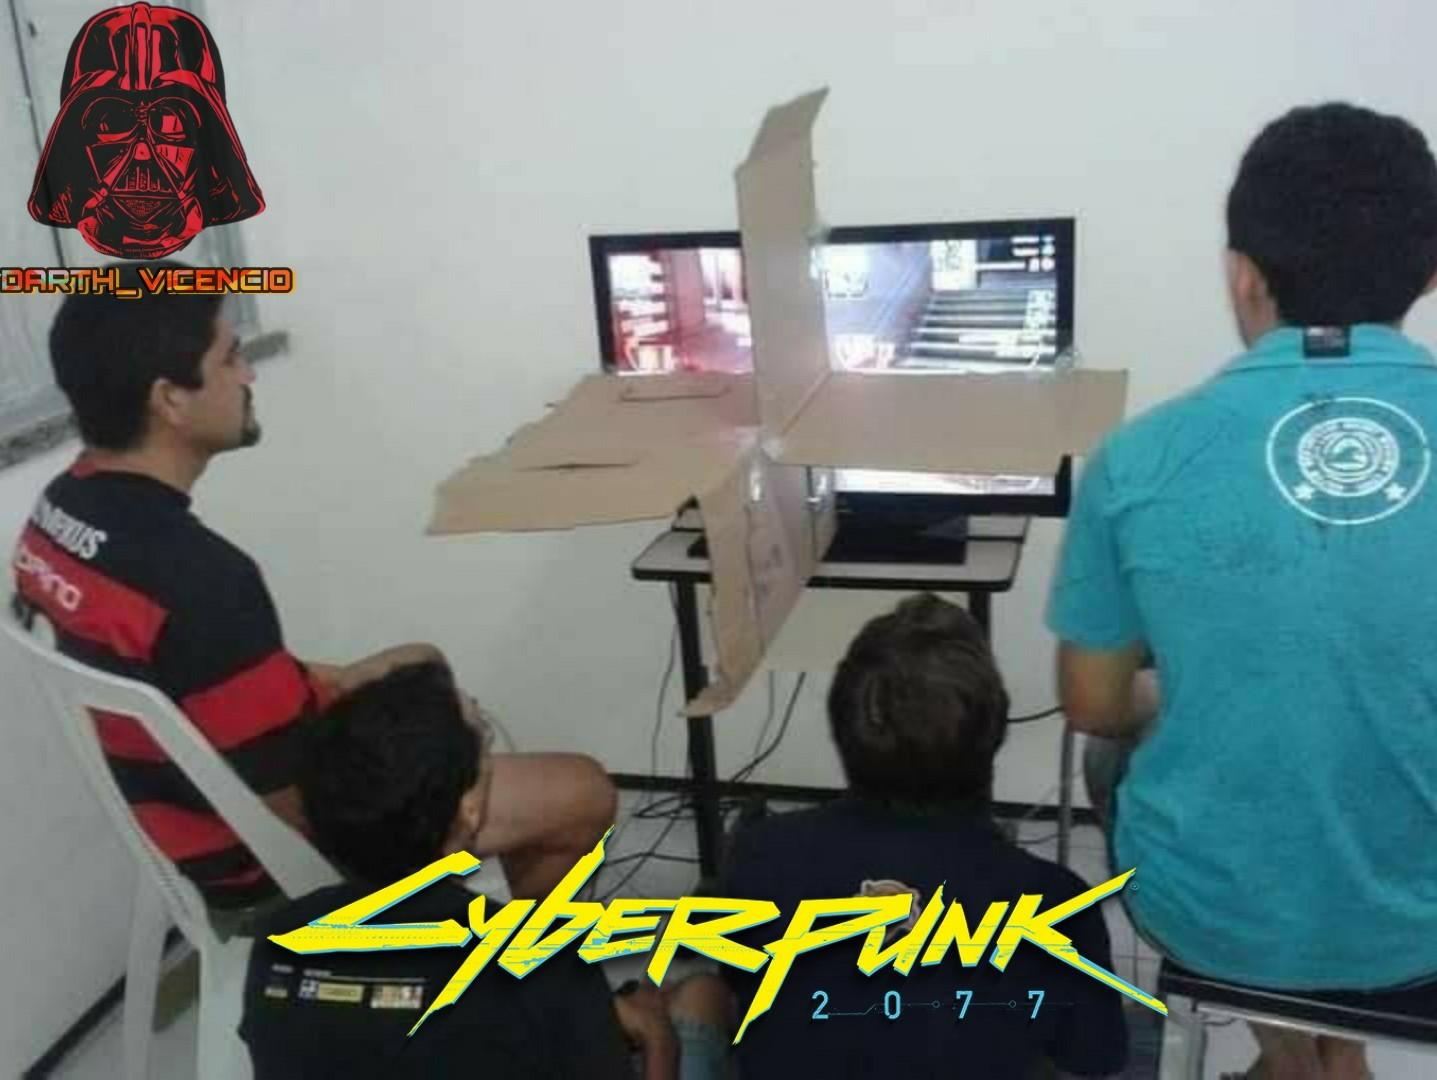 Un poco pasado de moda lo de Cyberpunk - meme